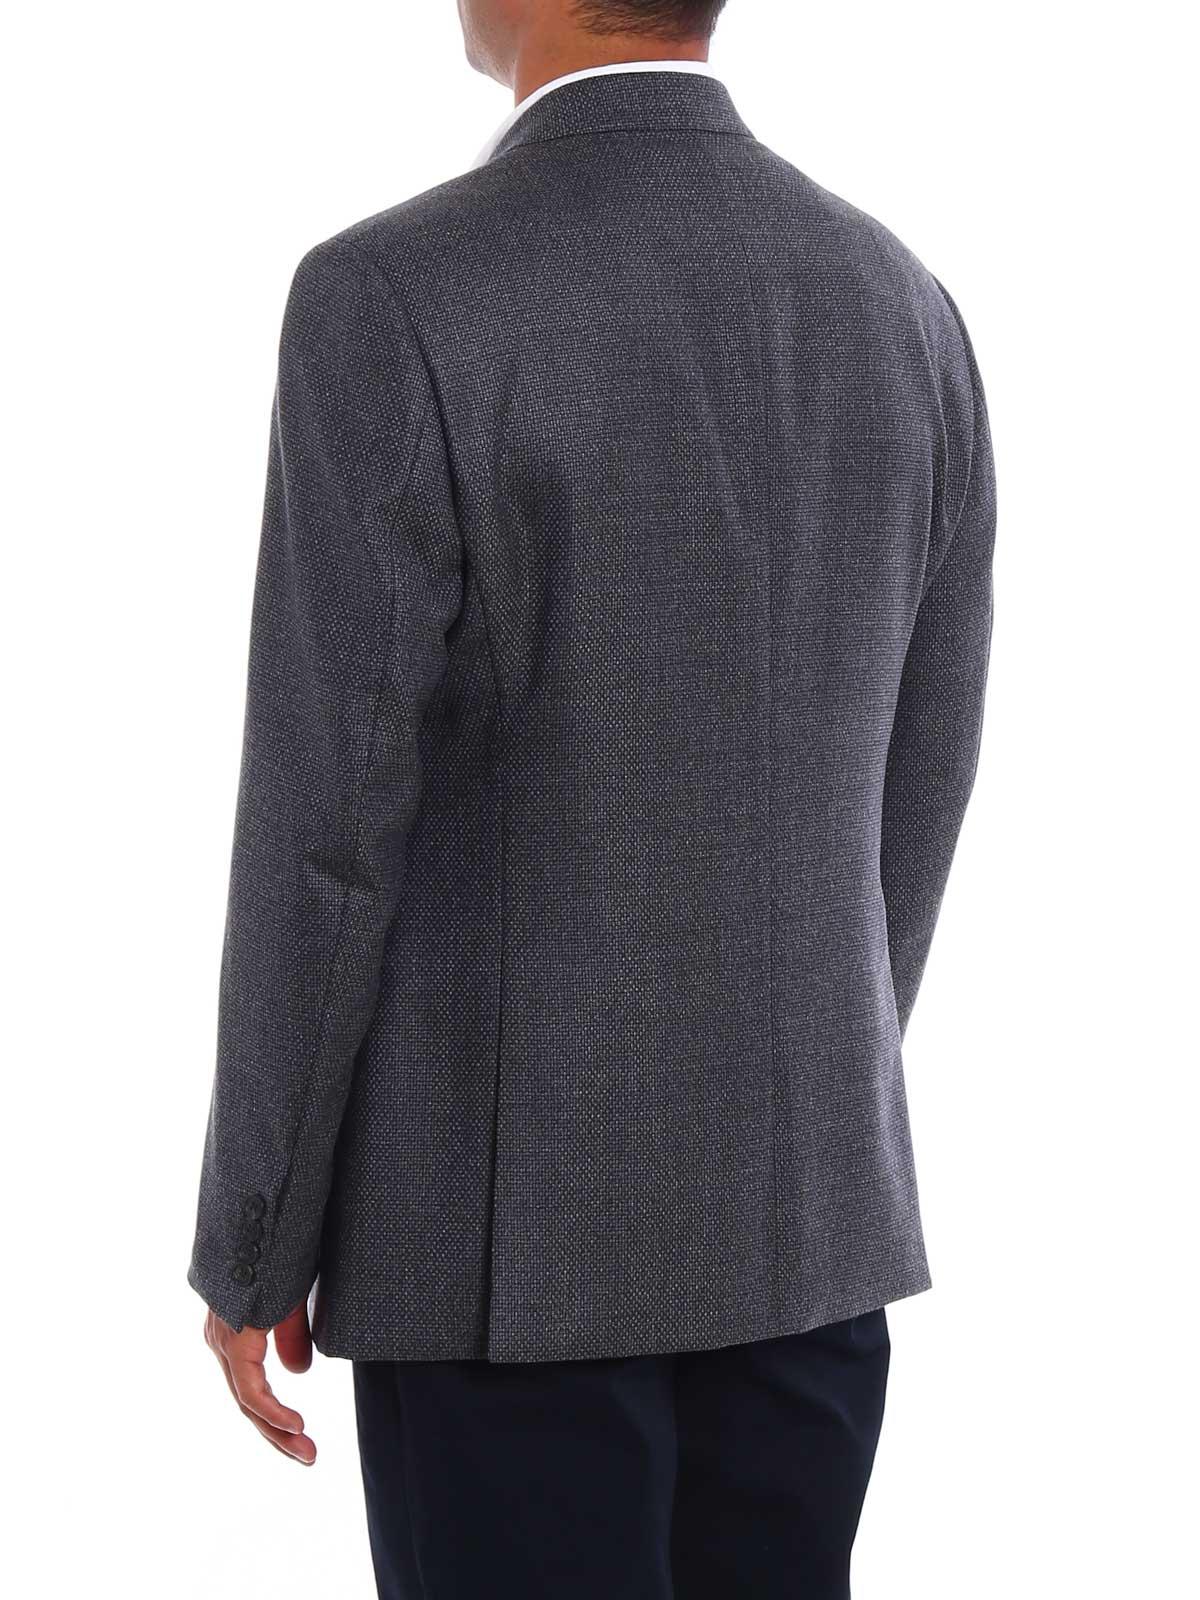 reputable site 940c4 0e05a ARMANI Giacche Giacca in lana e cashmere jacquard